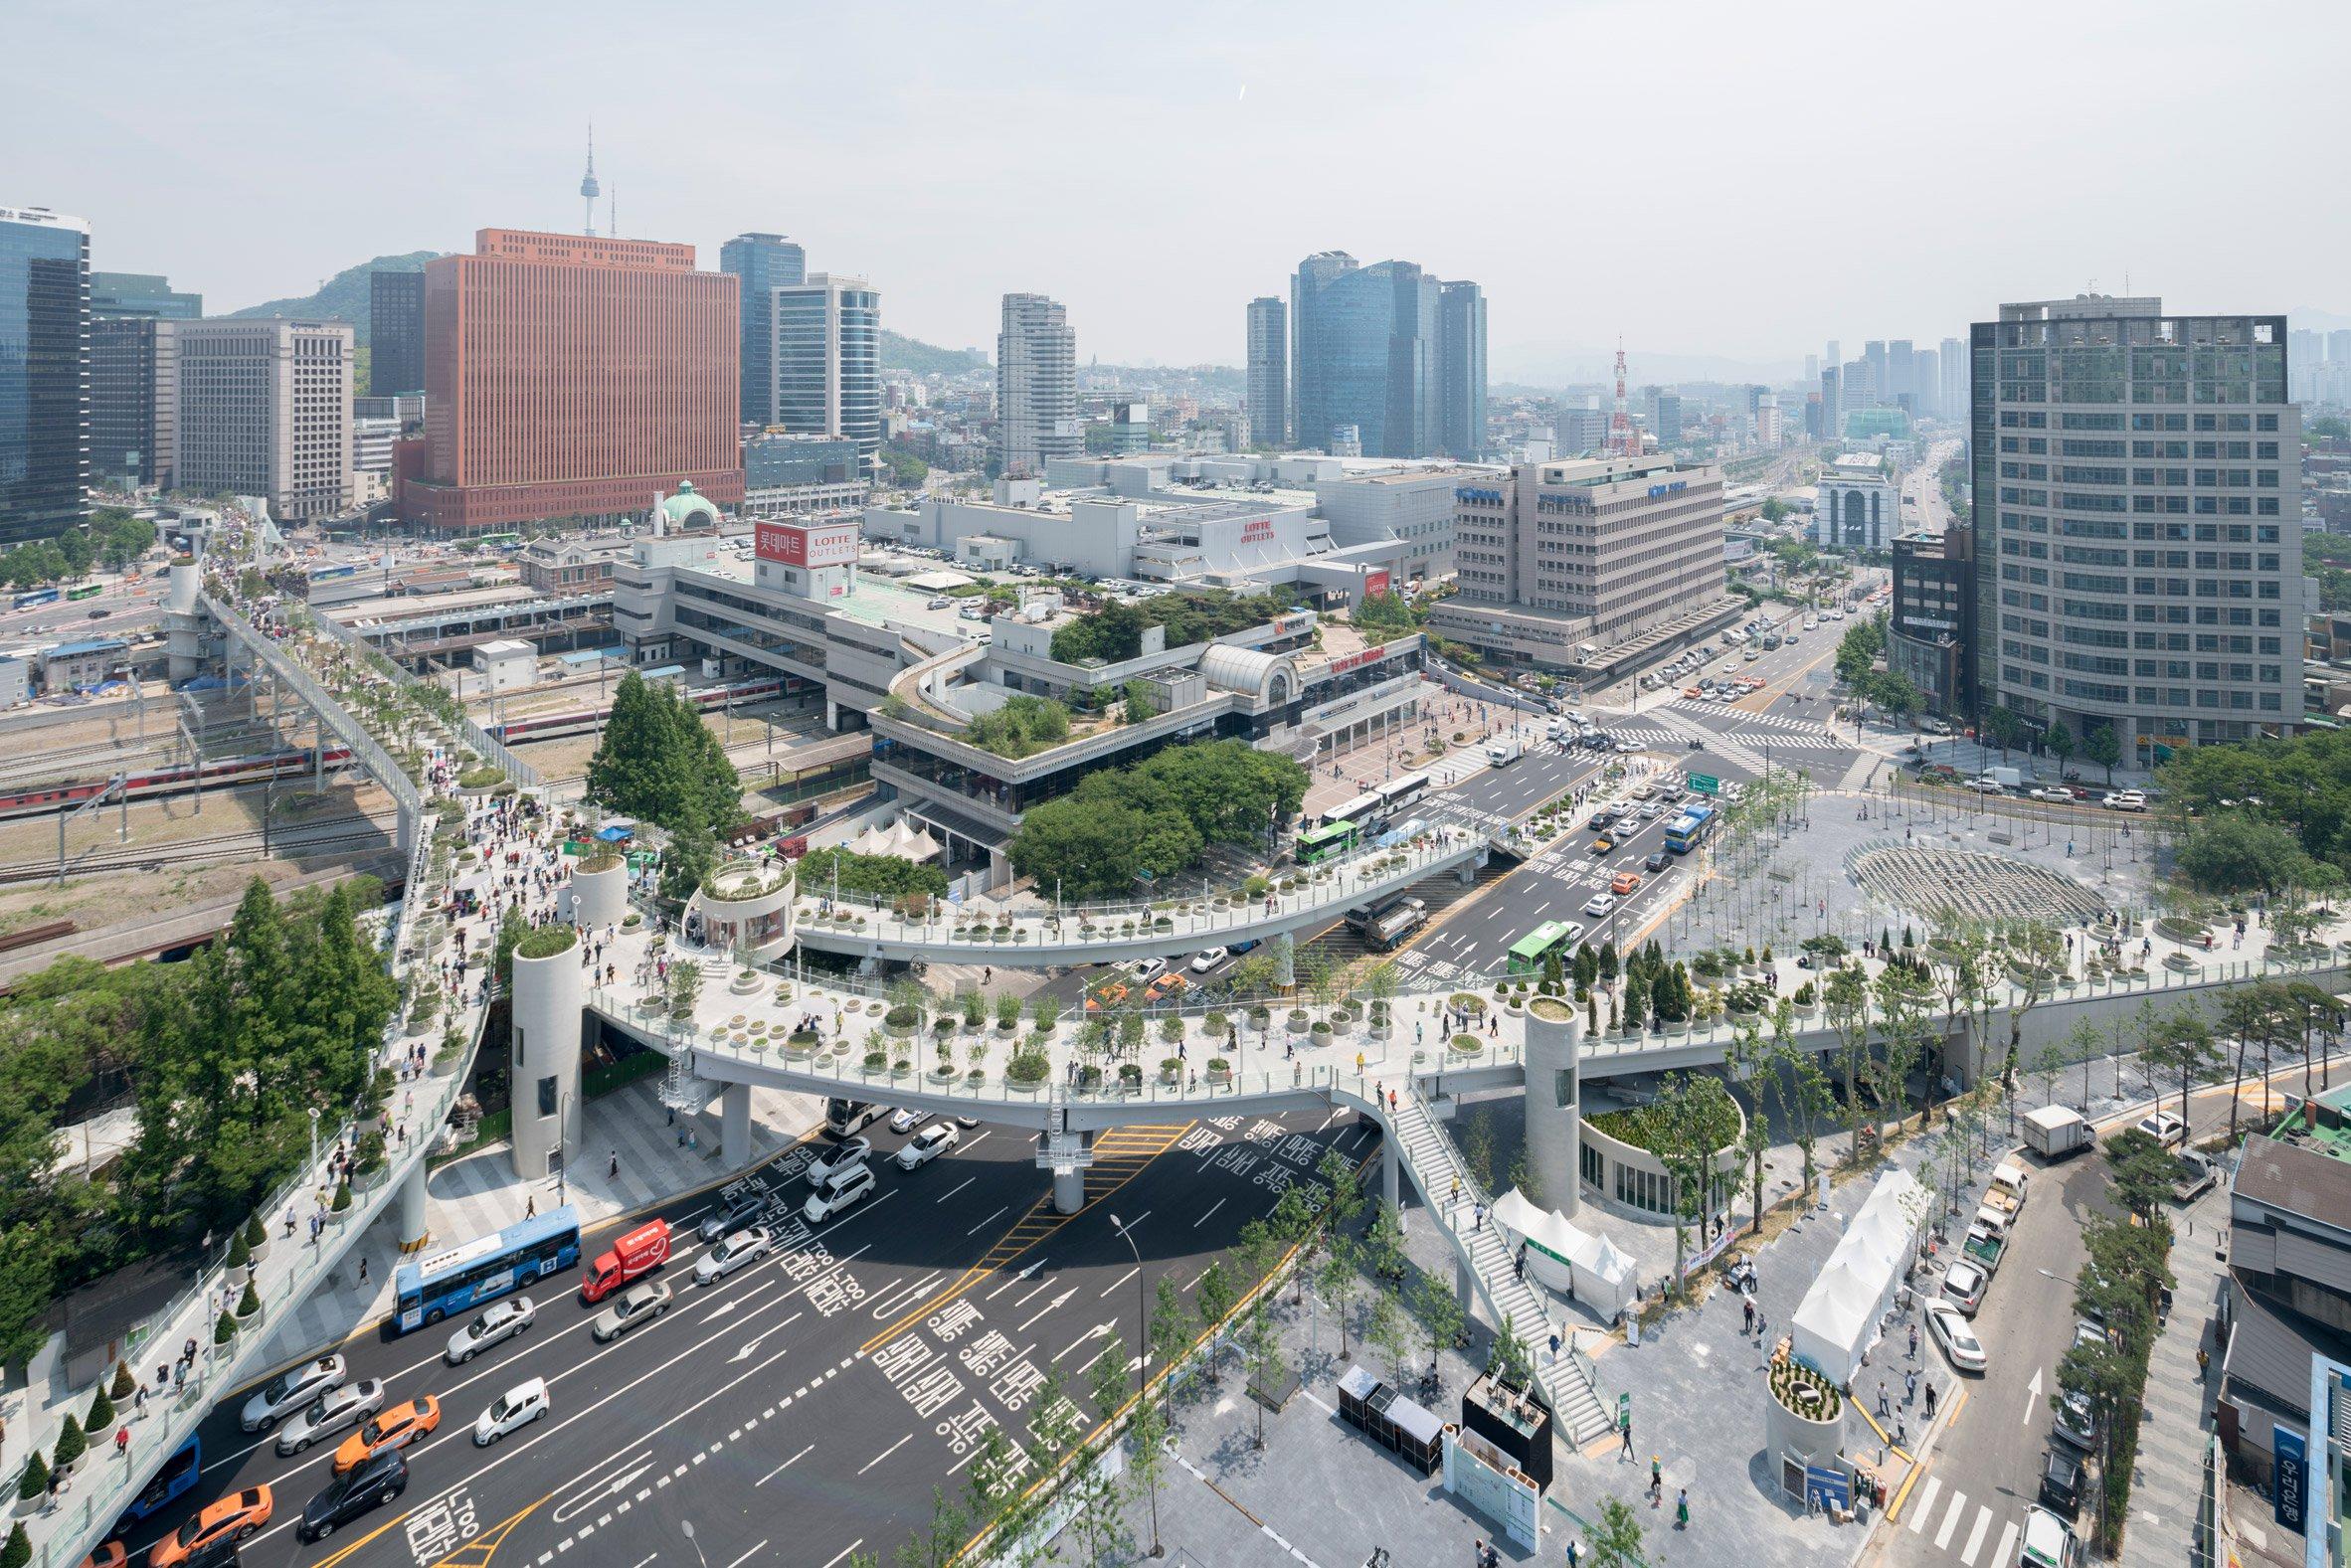 skygarden-mvrdv-architecture-landscape-urbanism-seoul-south-korea-_dezeen_2364_col_22.jpg